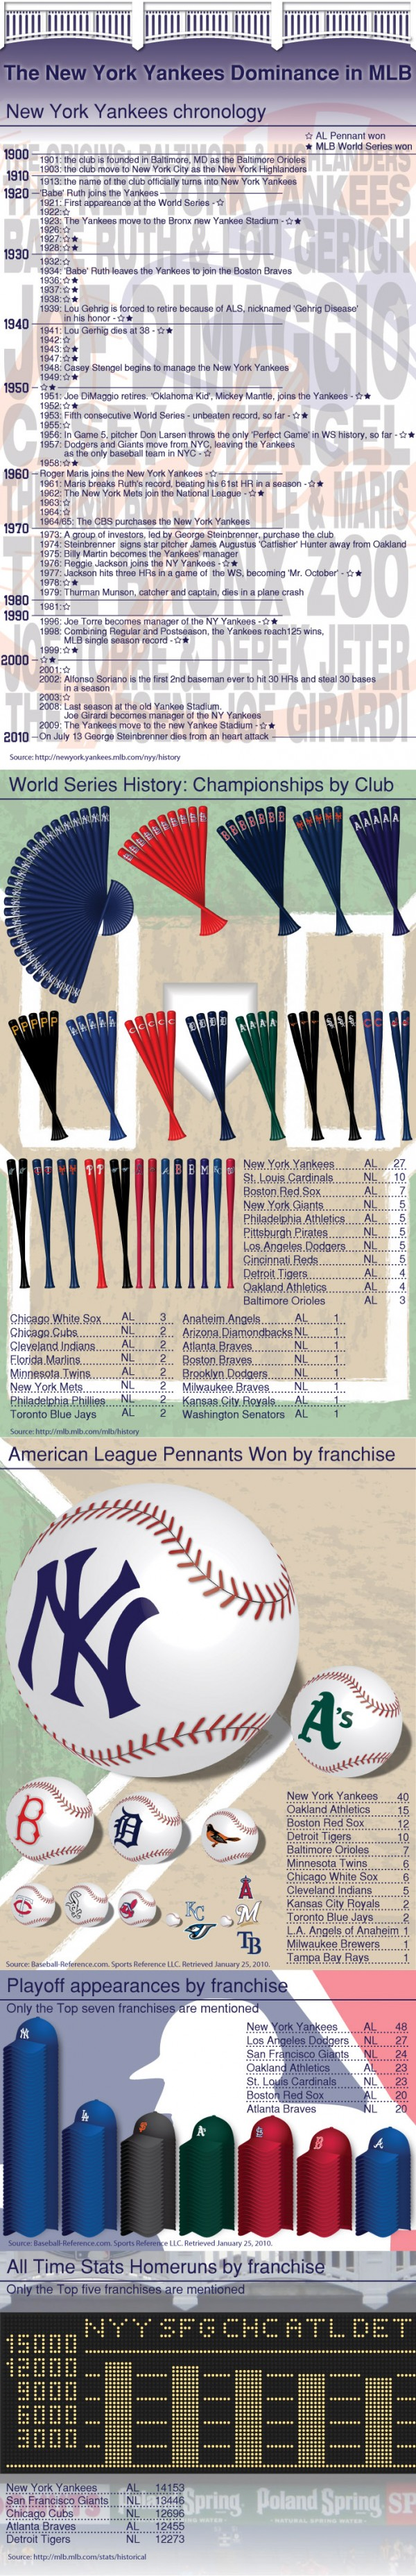 16. The New York Yankees